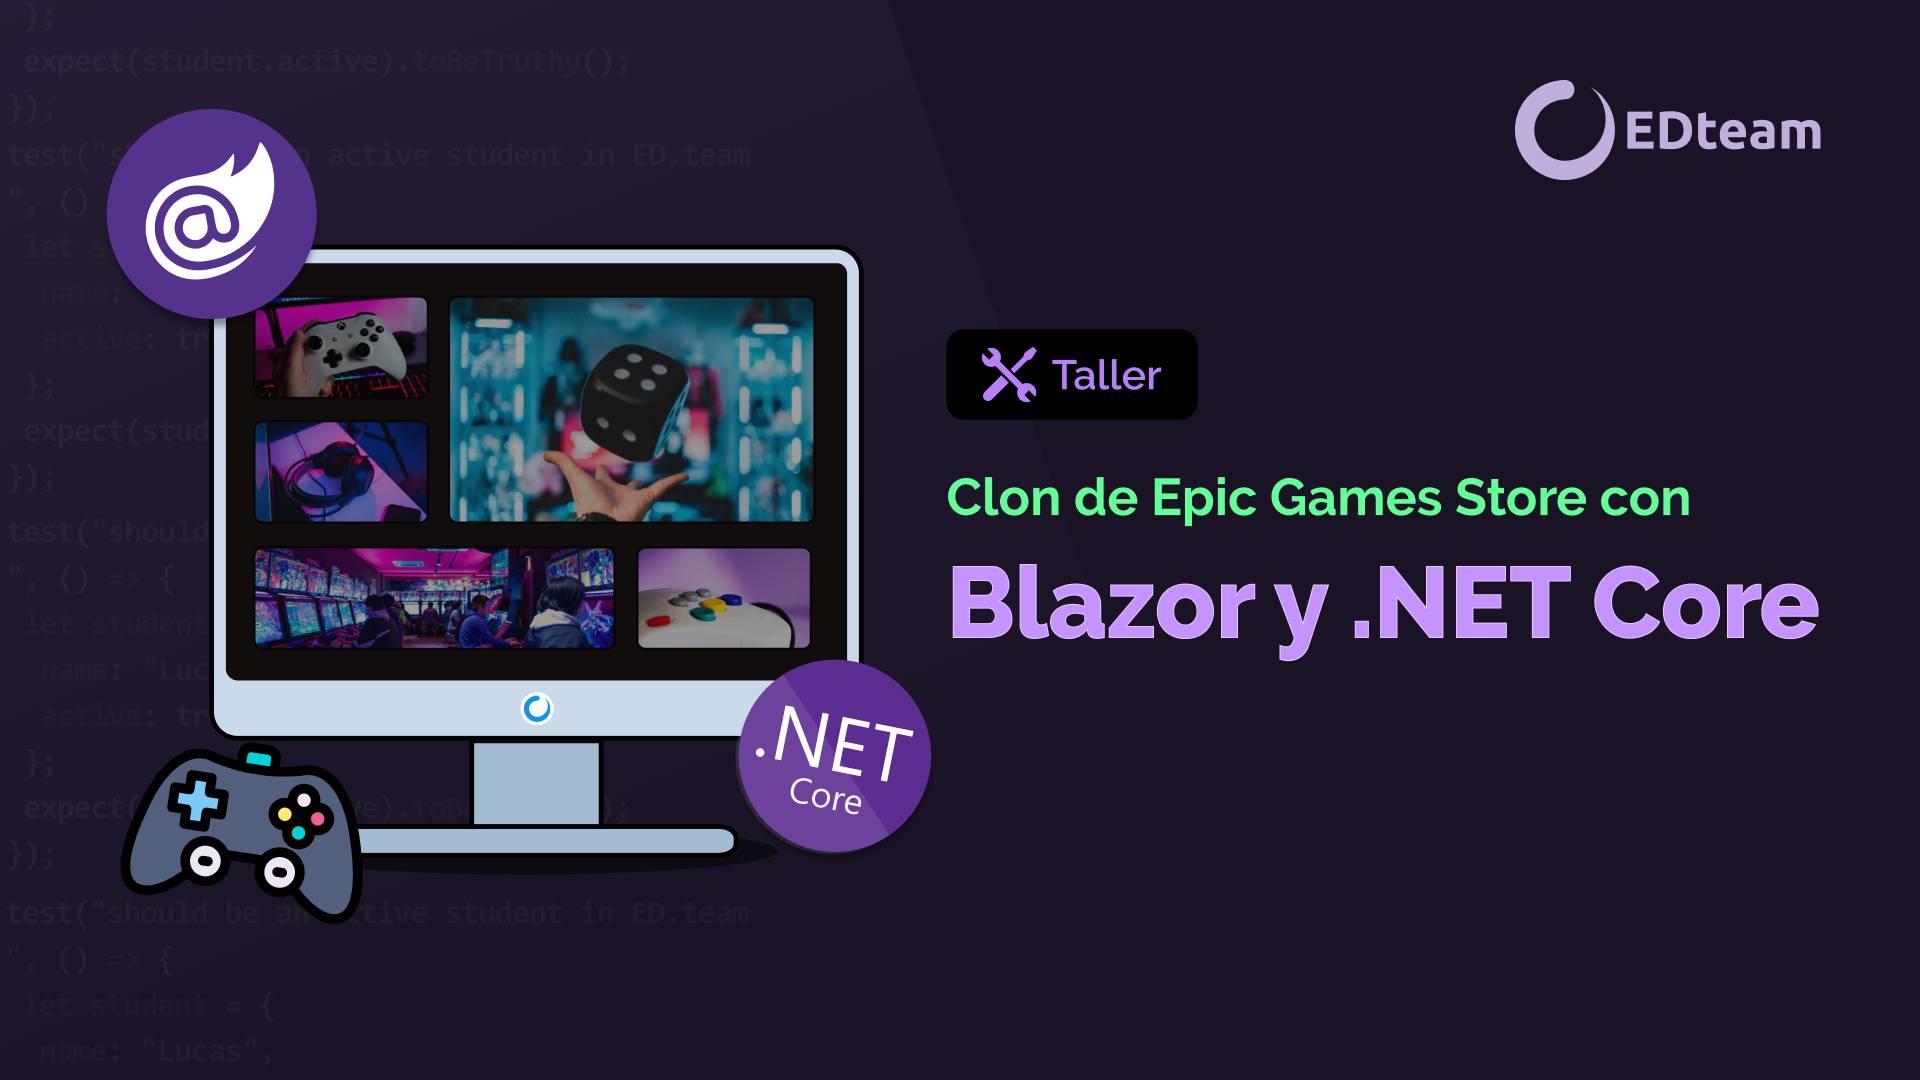 Clon de Epic Games Store con Blazor y Web Assembly